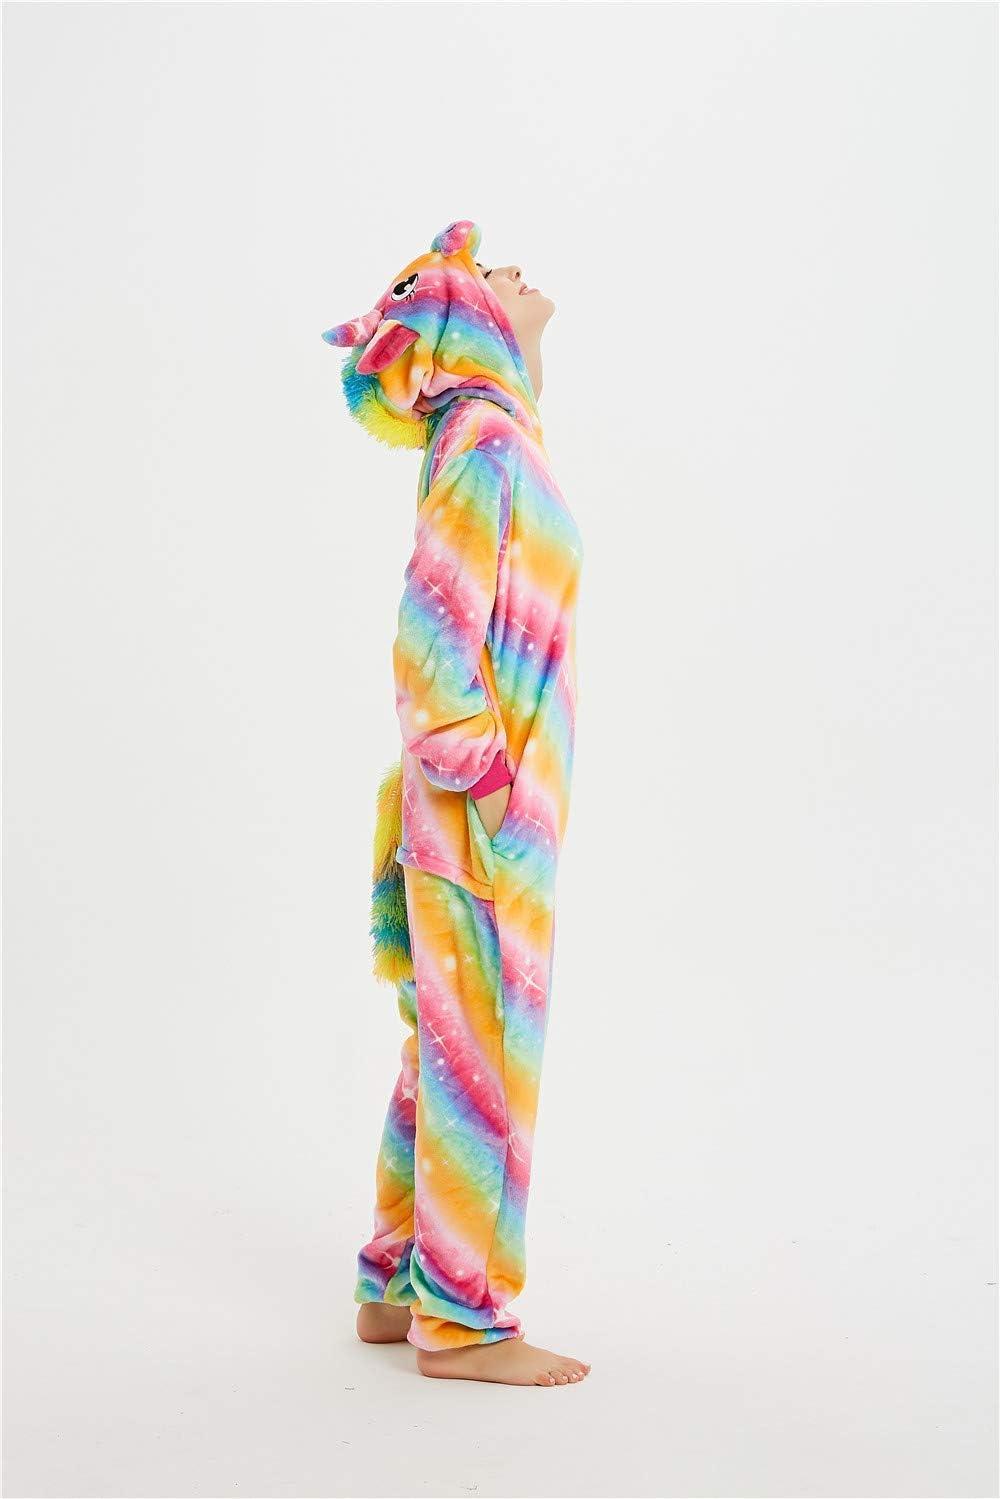 Blau Rosa Einhorn, S 148-158cm CozofLuv Tier Pyjamas Kost/üm Nachtw/äsche Cosplay Kost/üme Einhorn Rentier Pyjamas f/ür Erwachsene Anzug Outfit